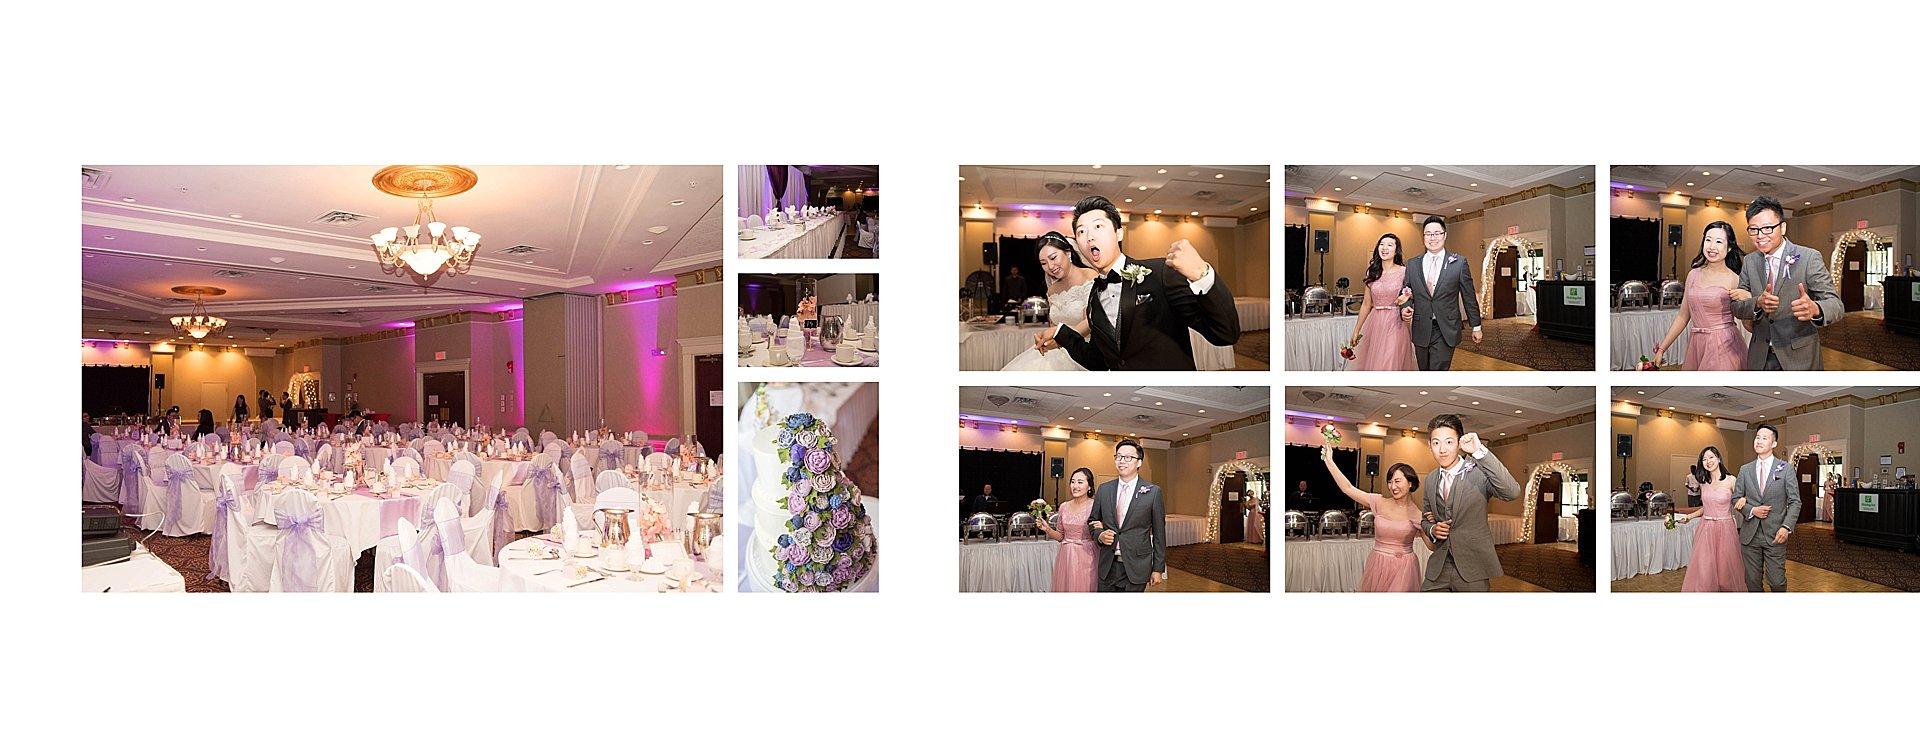 MB-First-Baptist-Church-Edmonton-Wedding-_0007